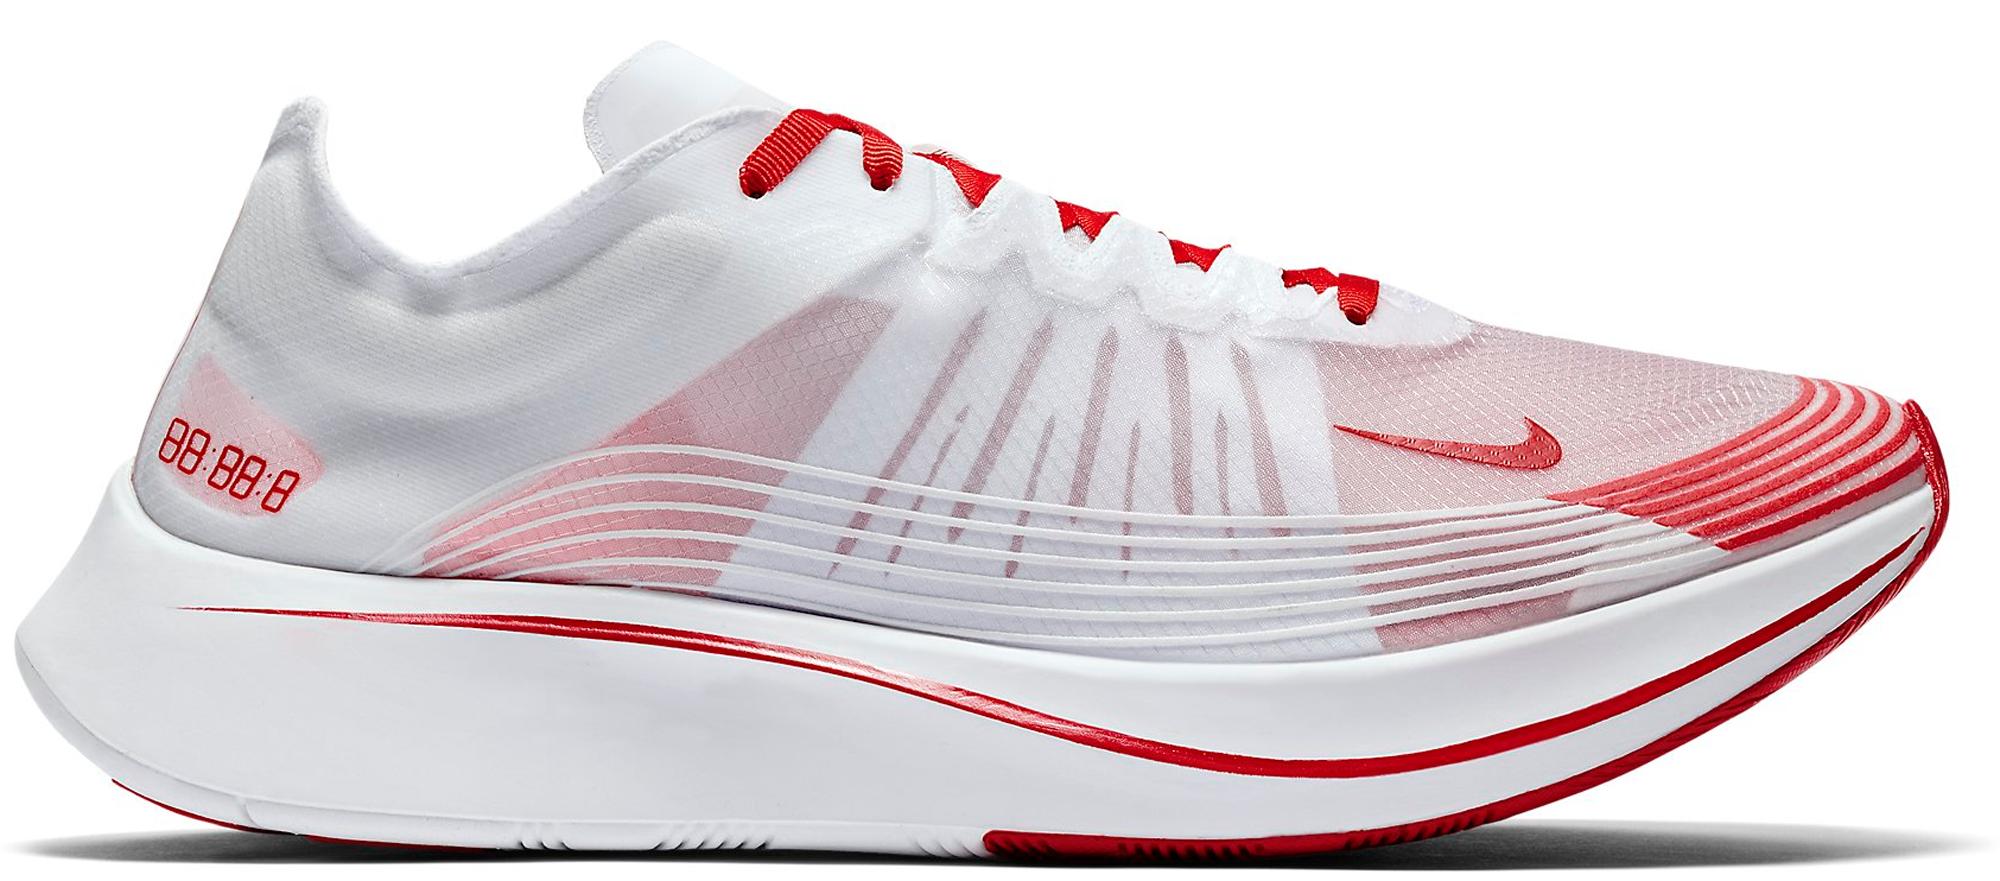 Nike Zoom Fly Tokyo